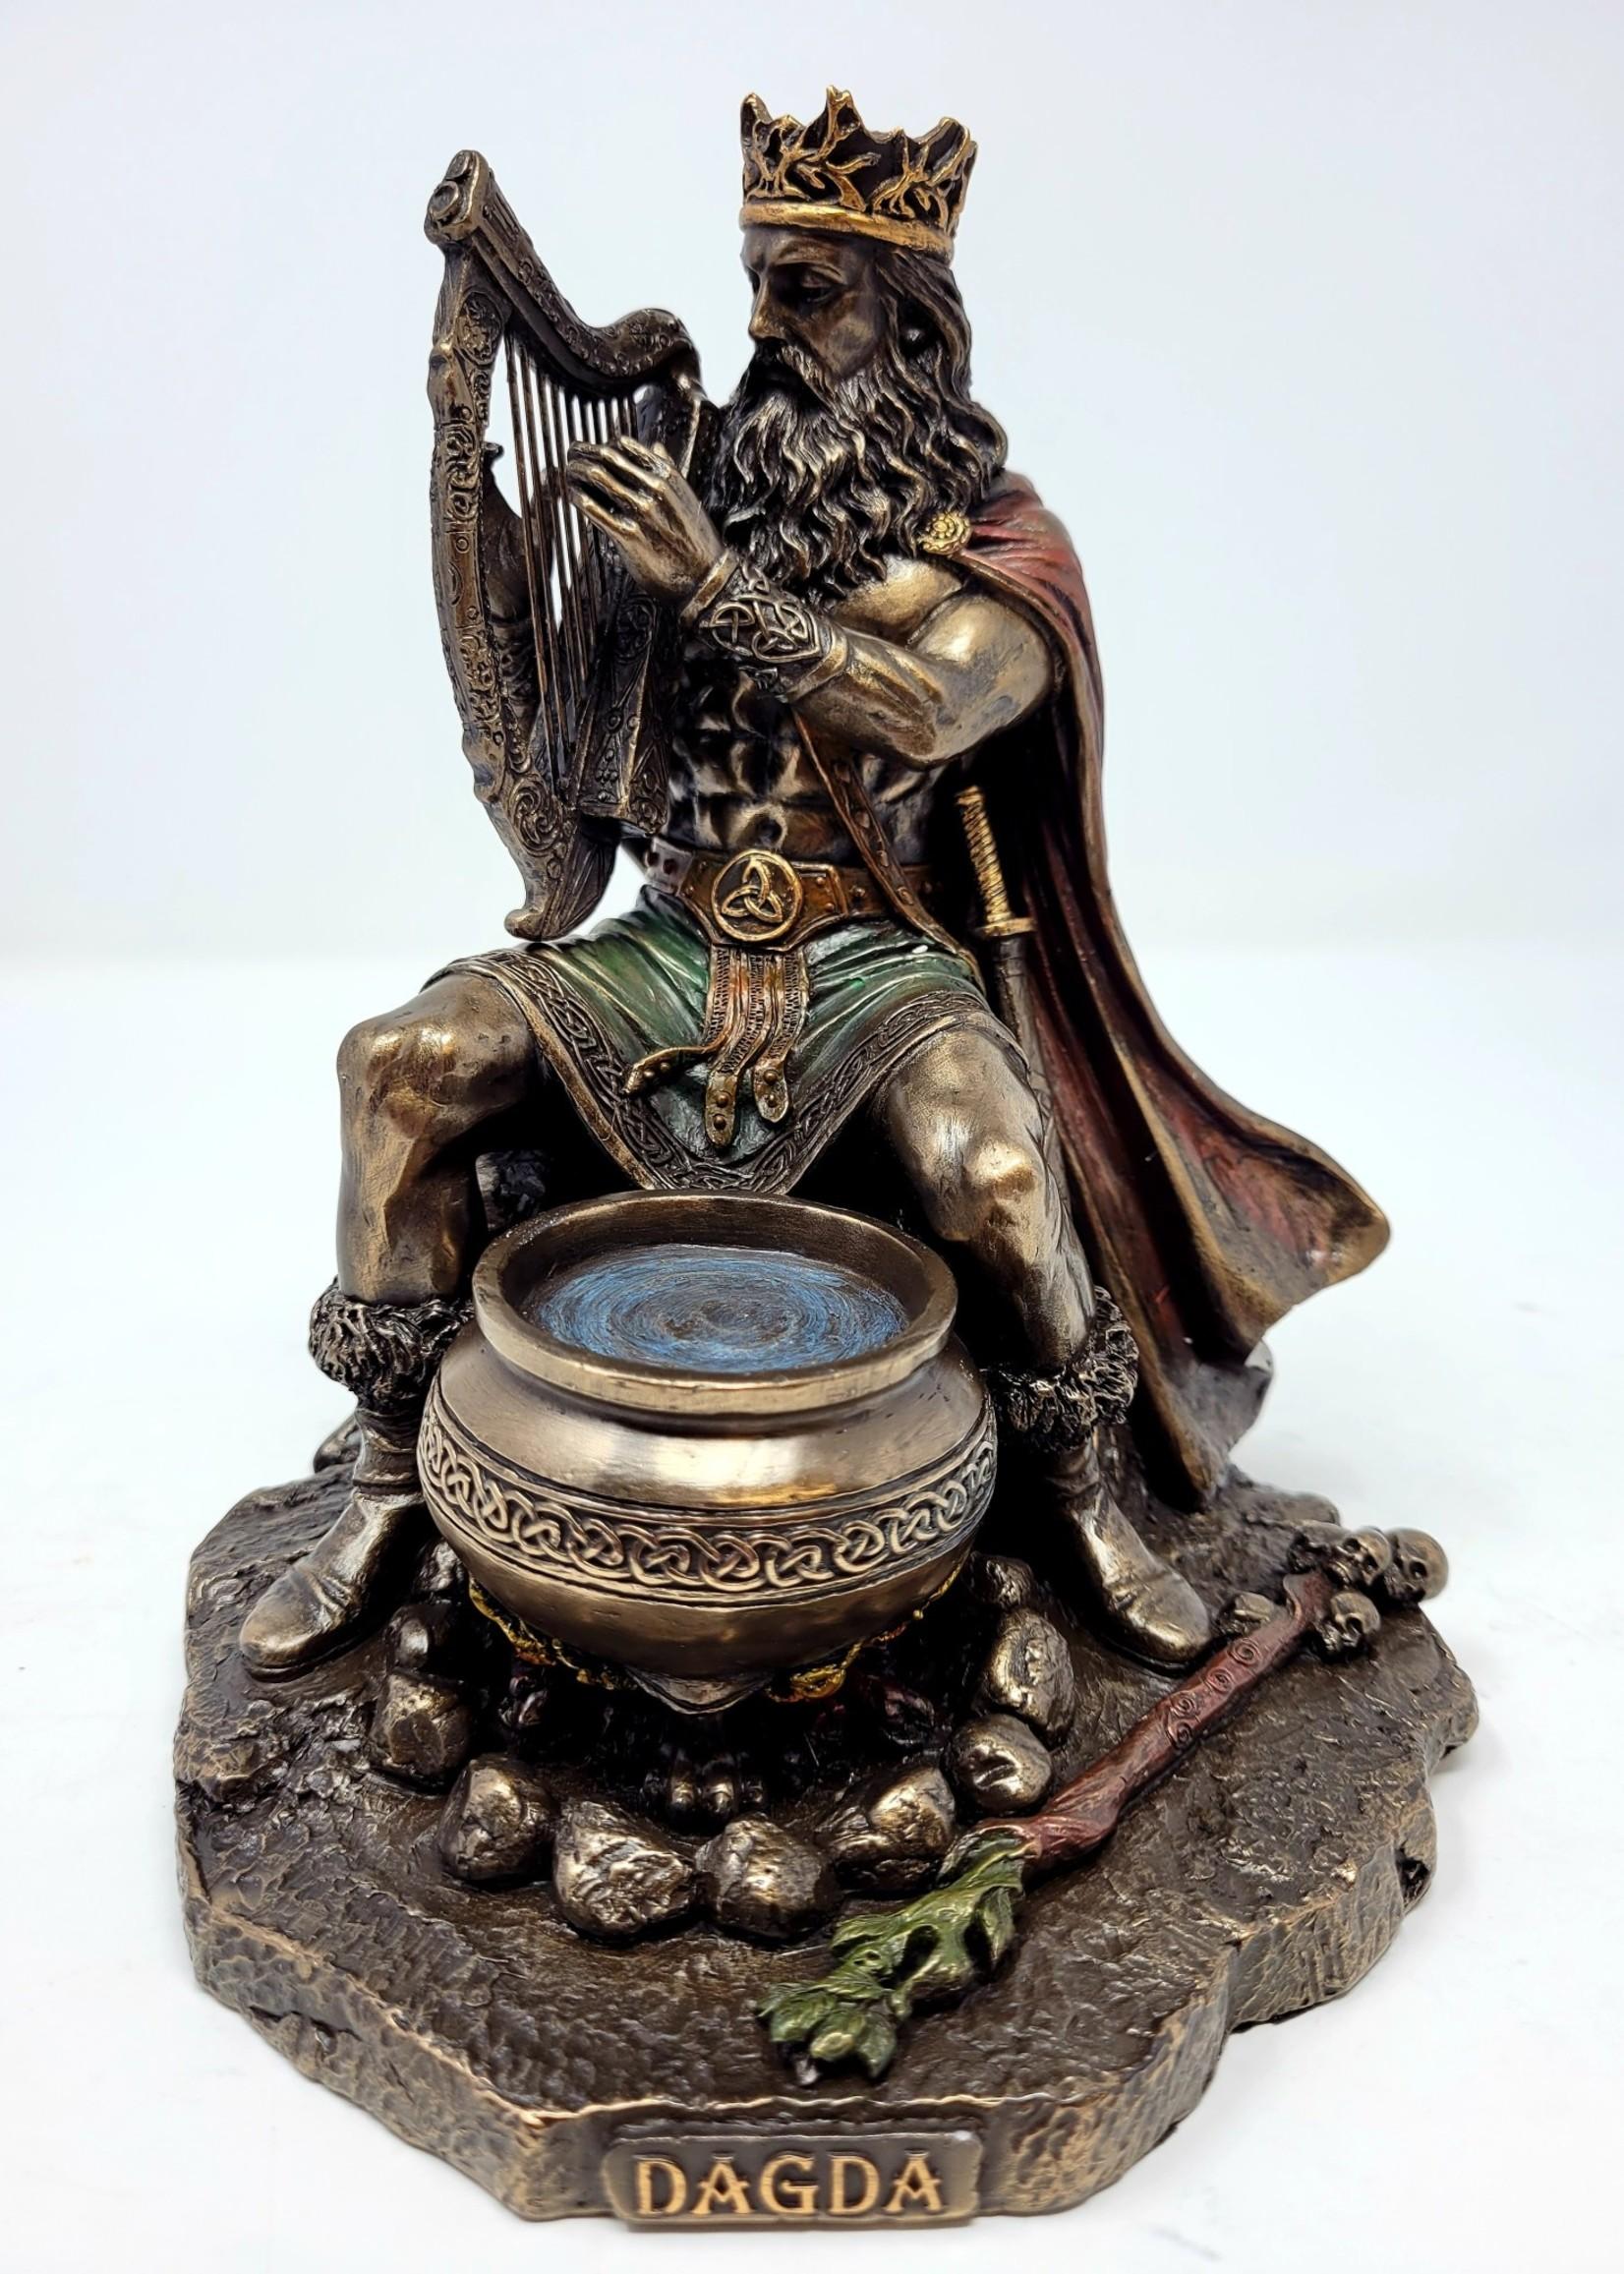 Dagda Celtic Druid King of Tuatha De Danann